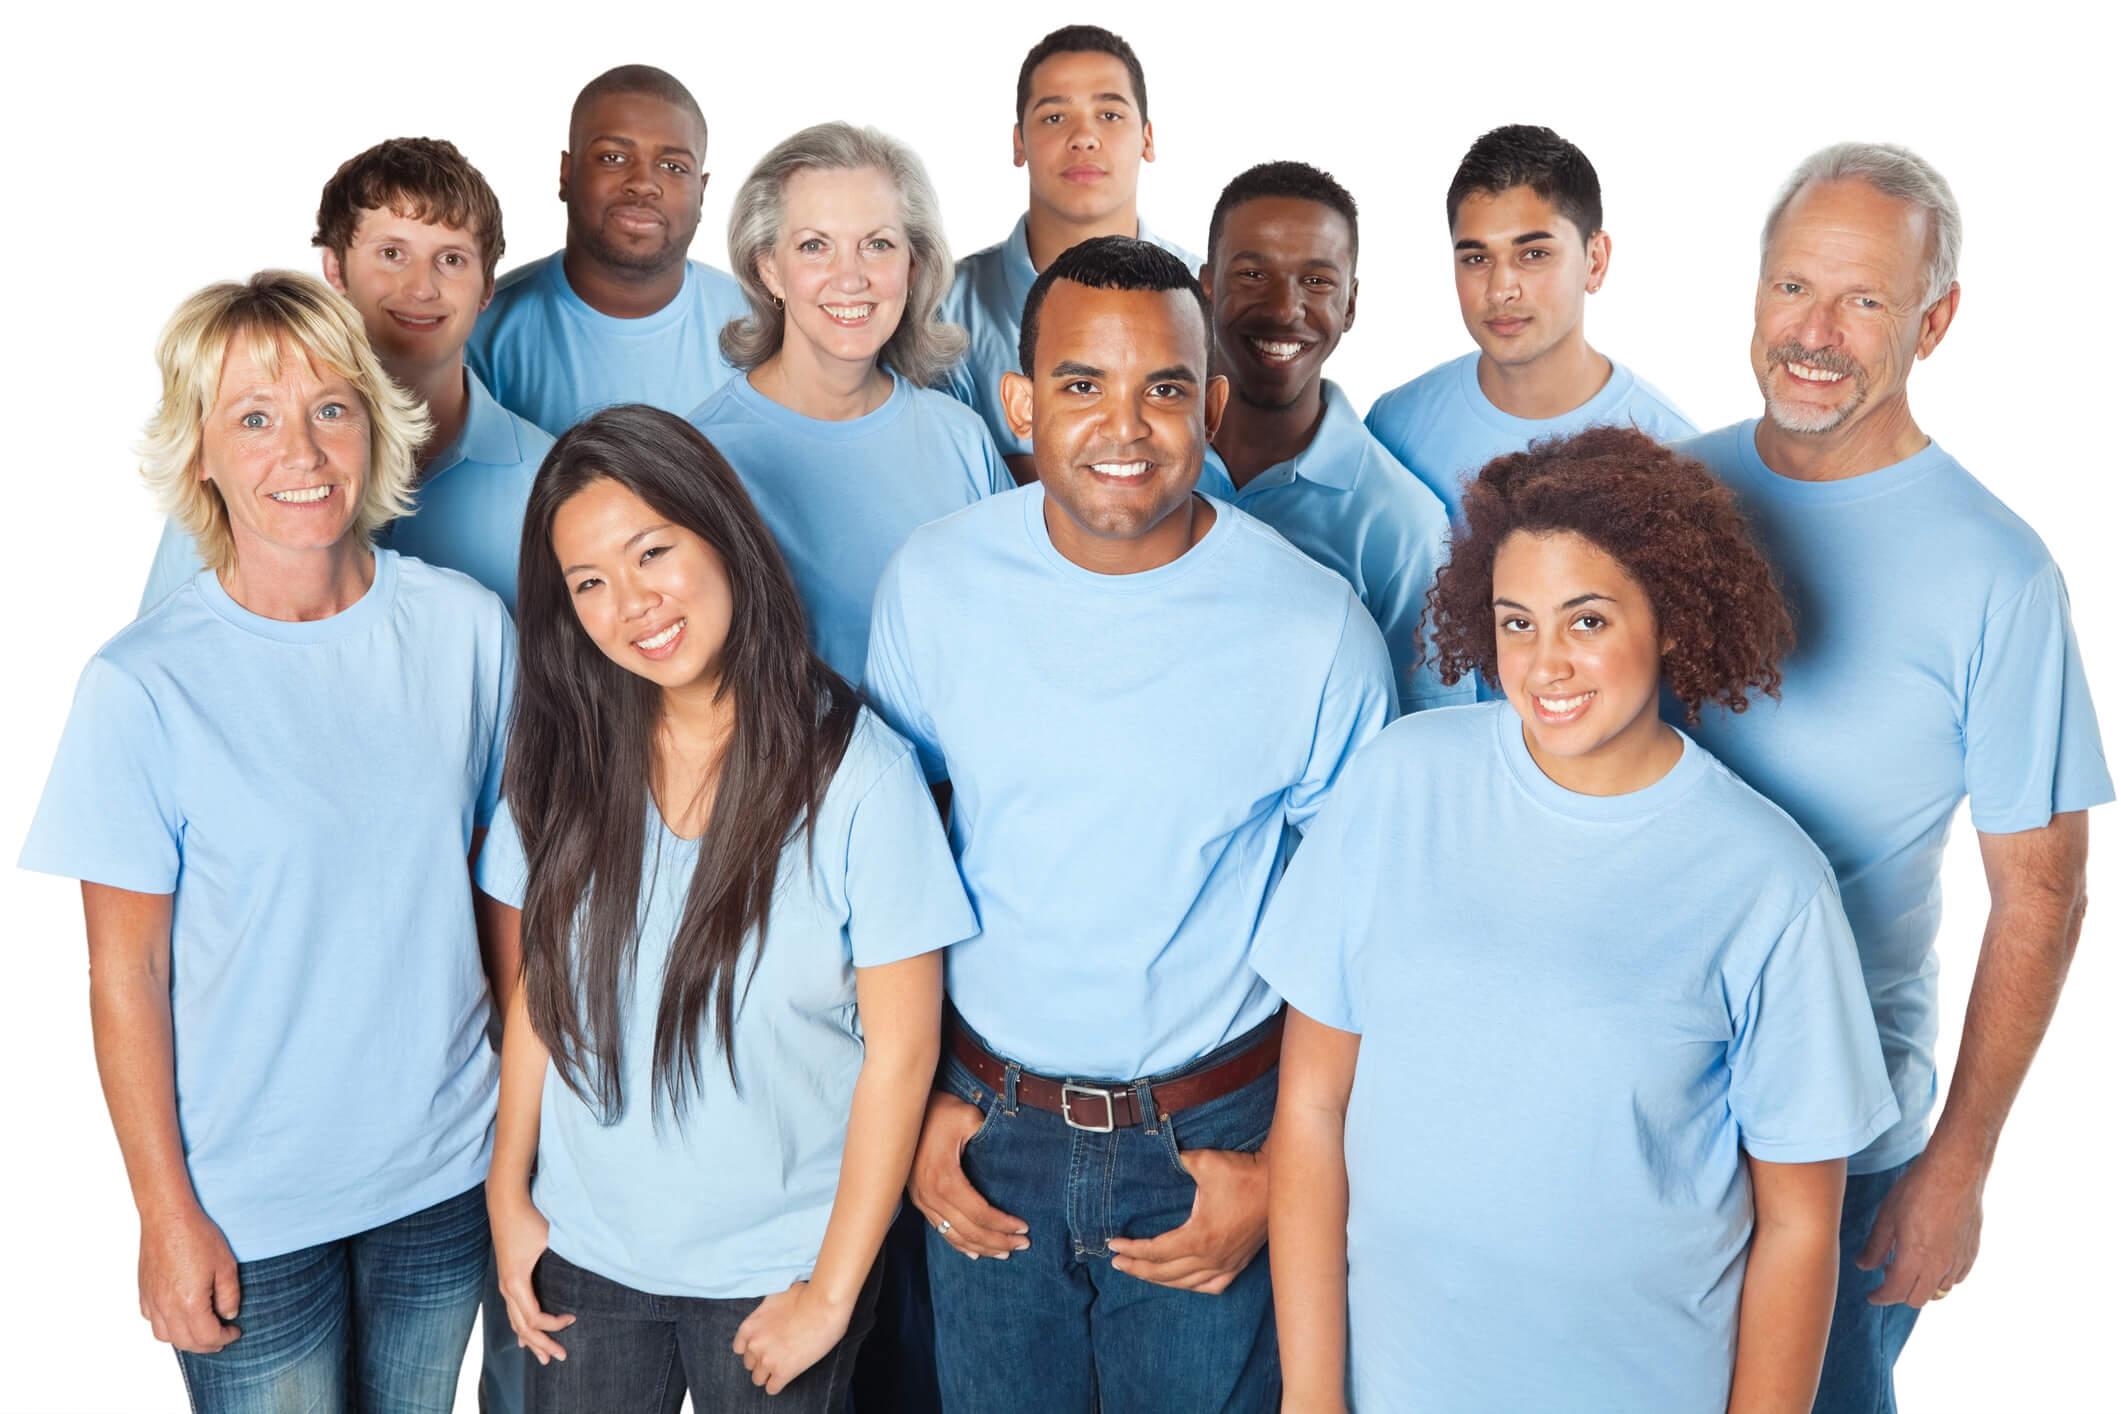 teambuilding in multinational teams